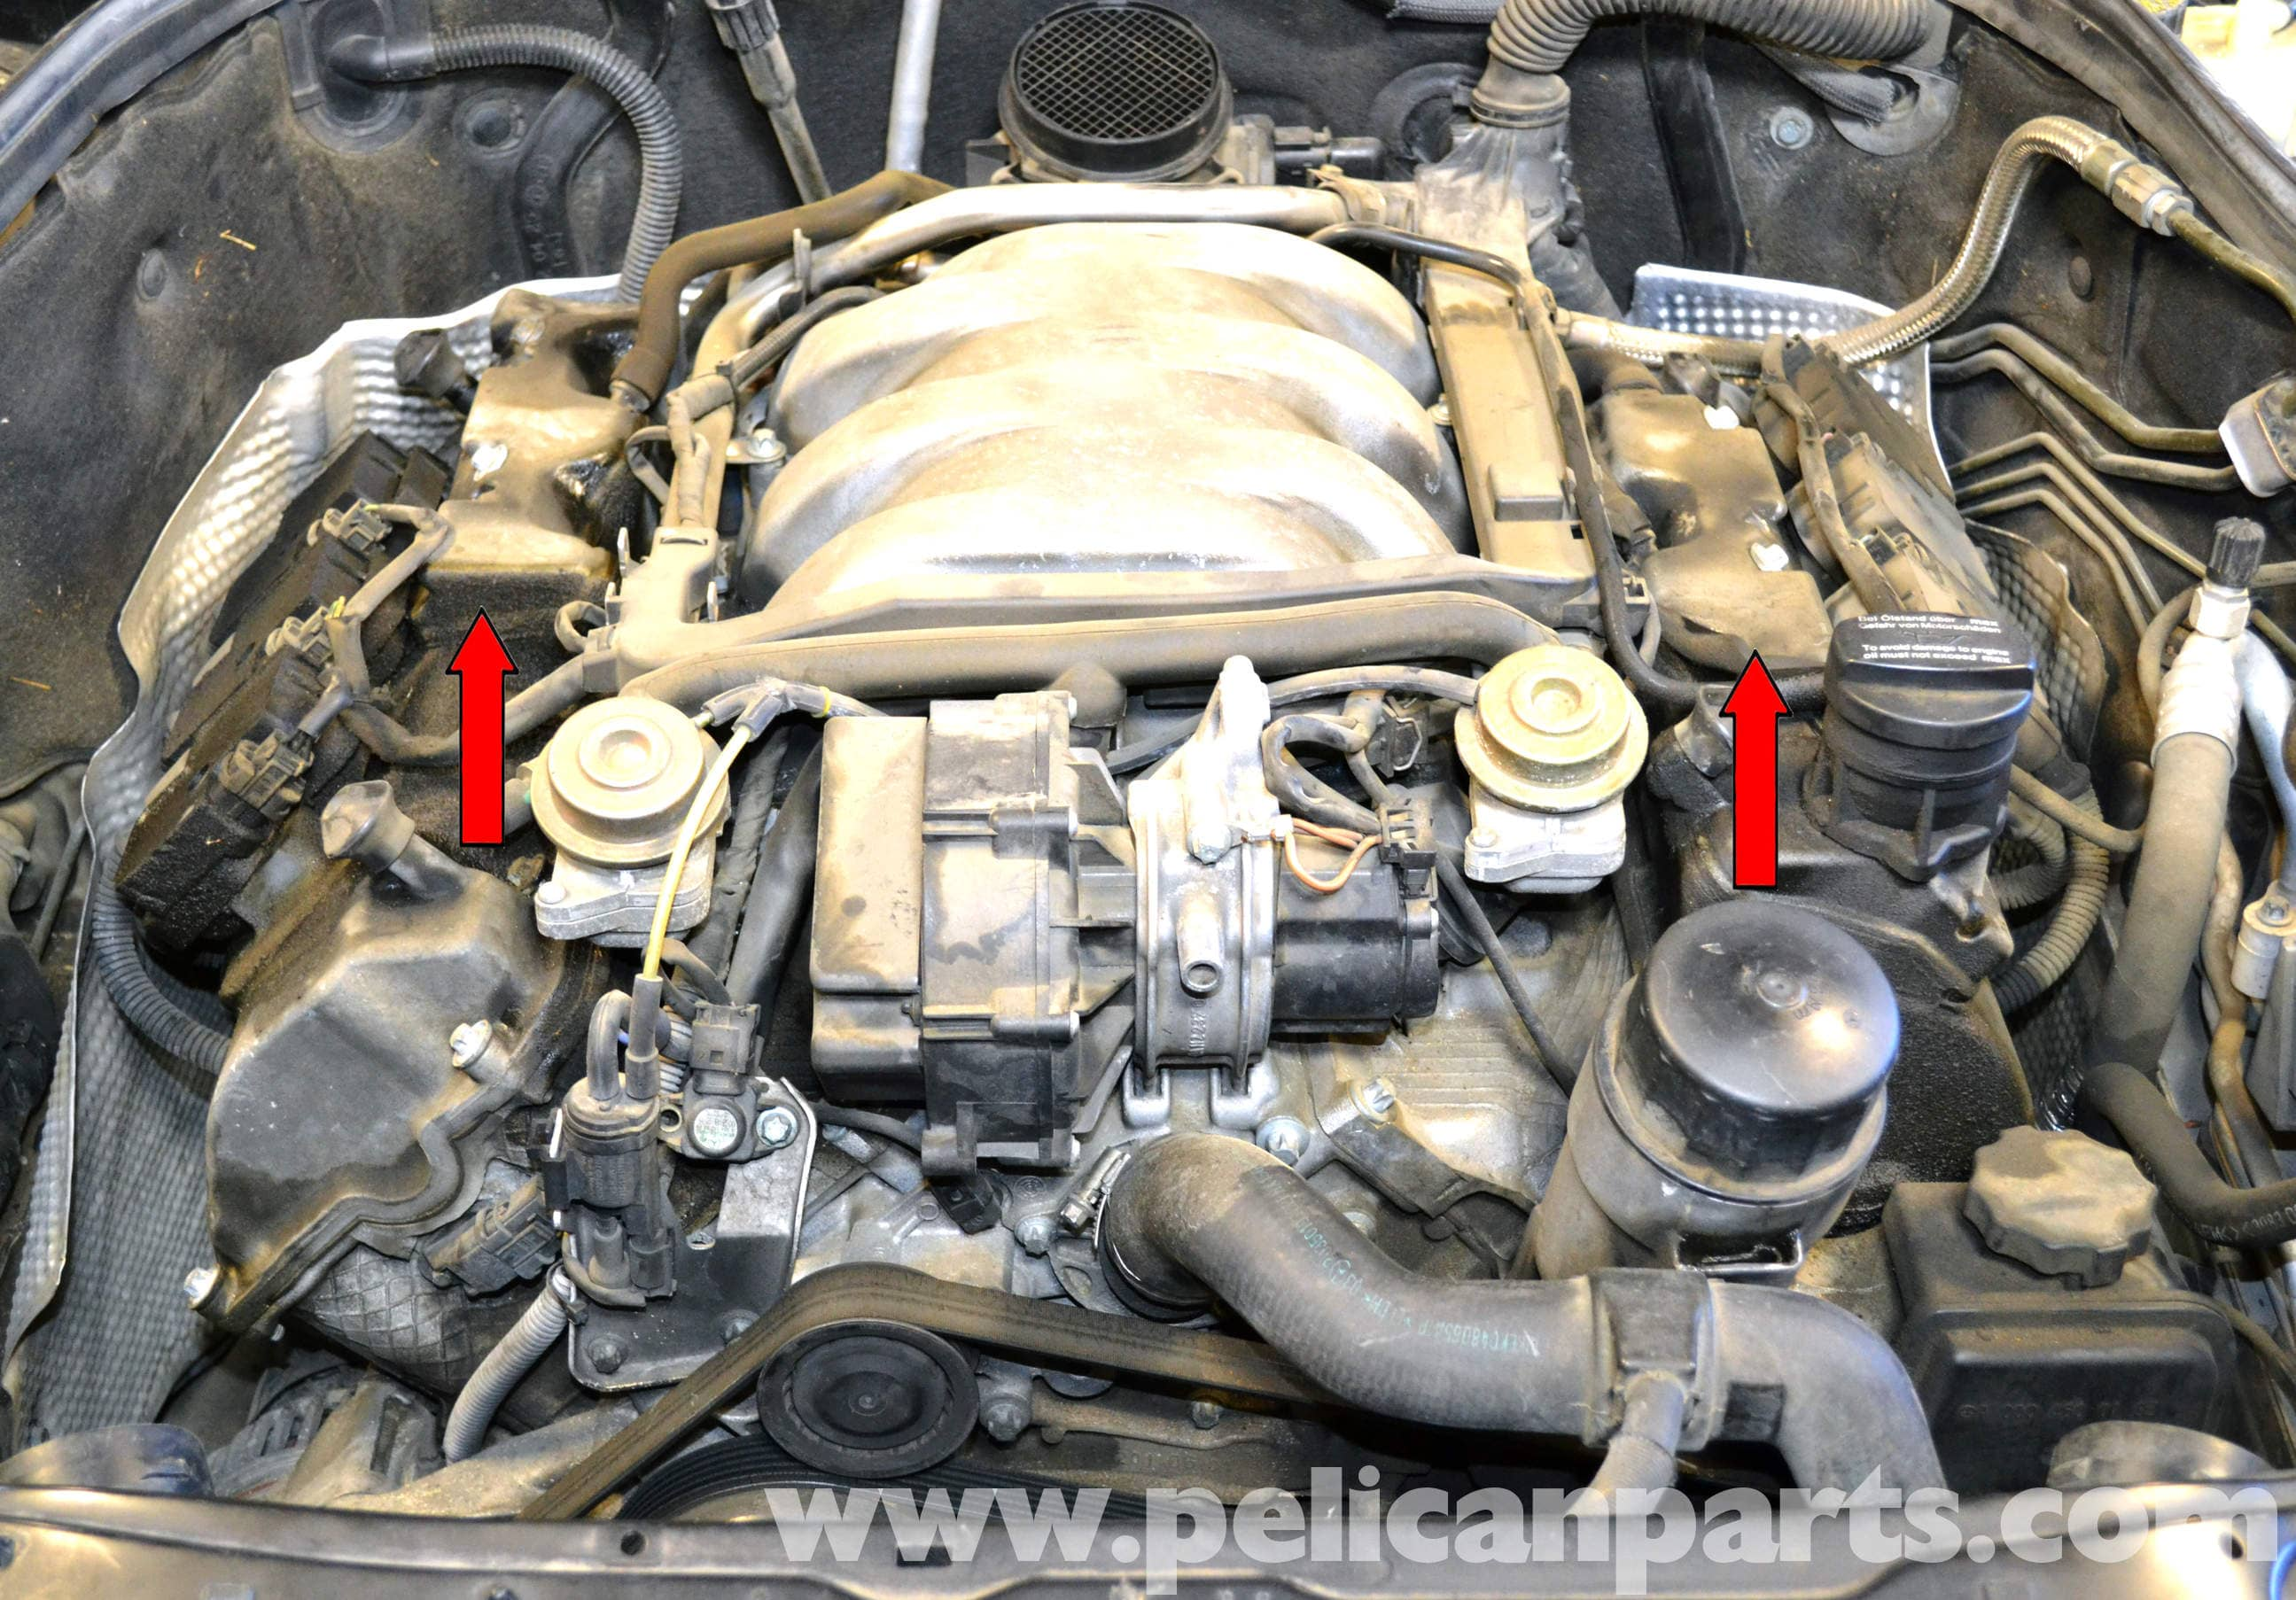 1999 Mercedes Benz Ml320 Engine Diagram Galaxy Cb Radio Mic Wiring Gsxr750 Yenpancane Jeanjaures37 Fr